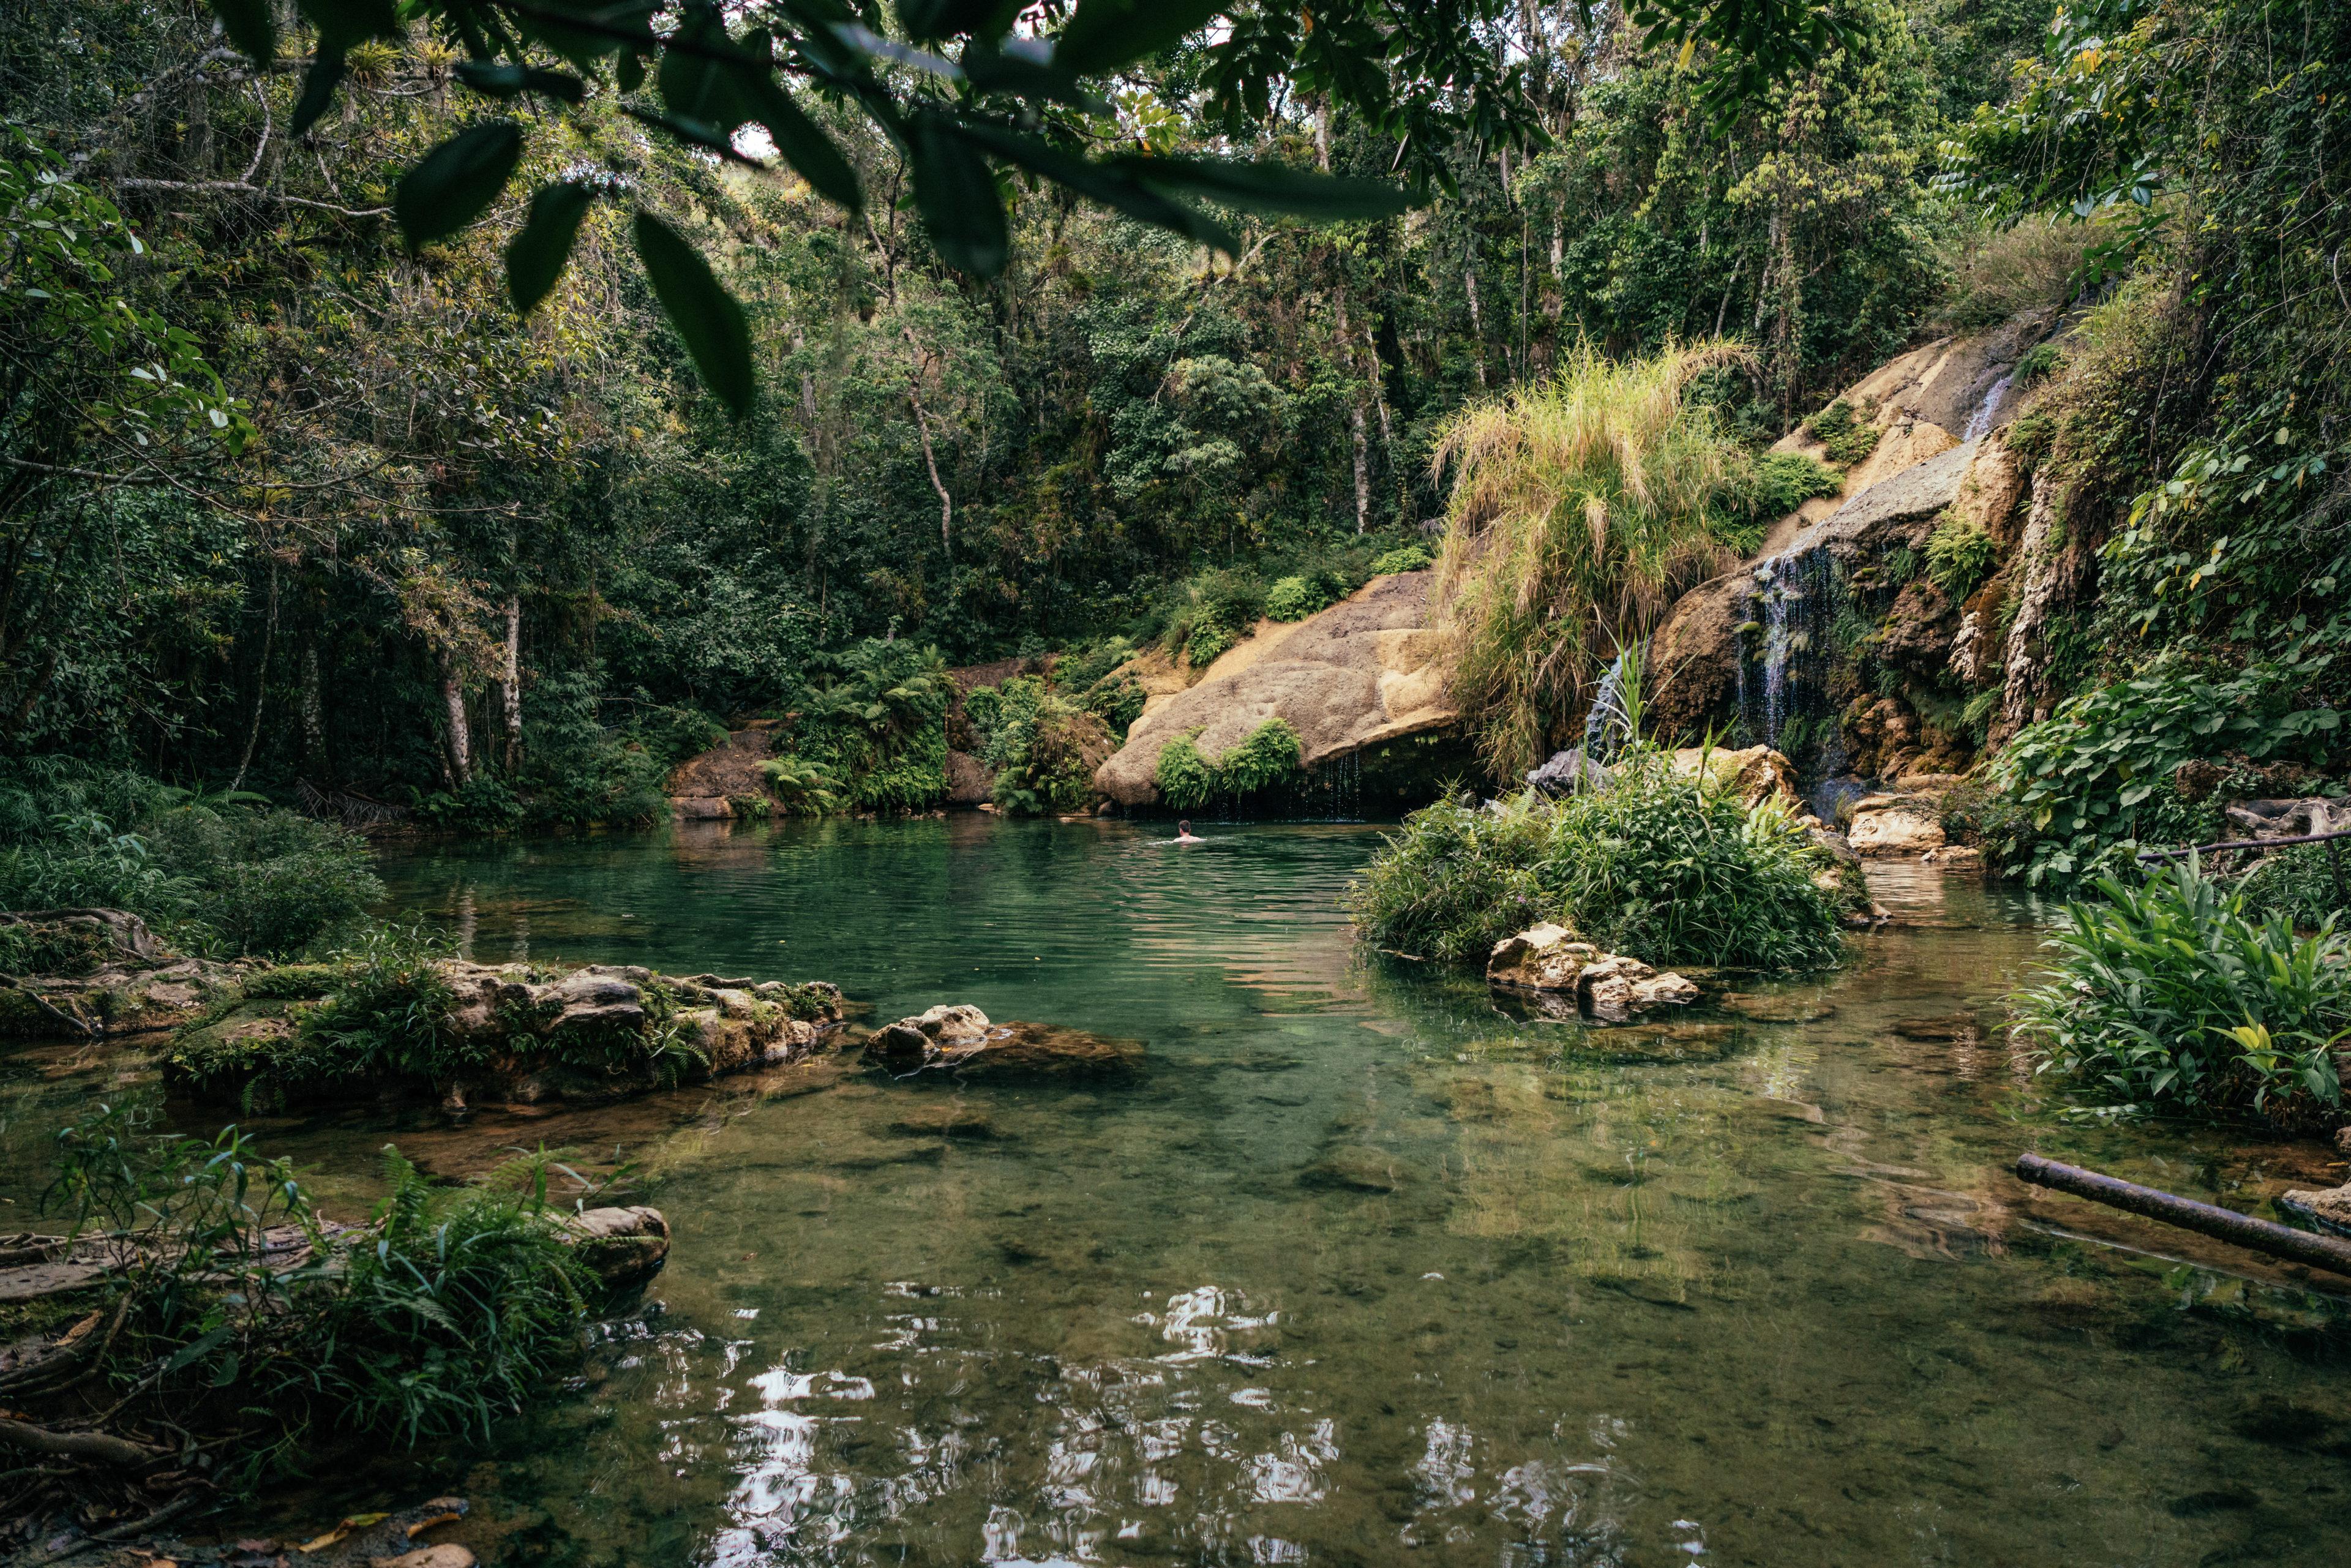 Badestelle im Nationalpark in Kuba